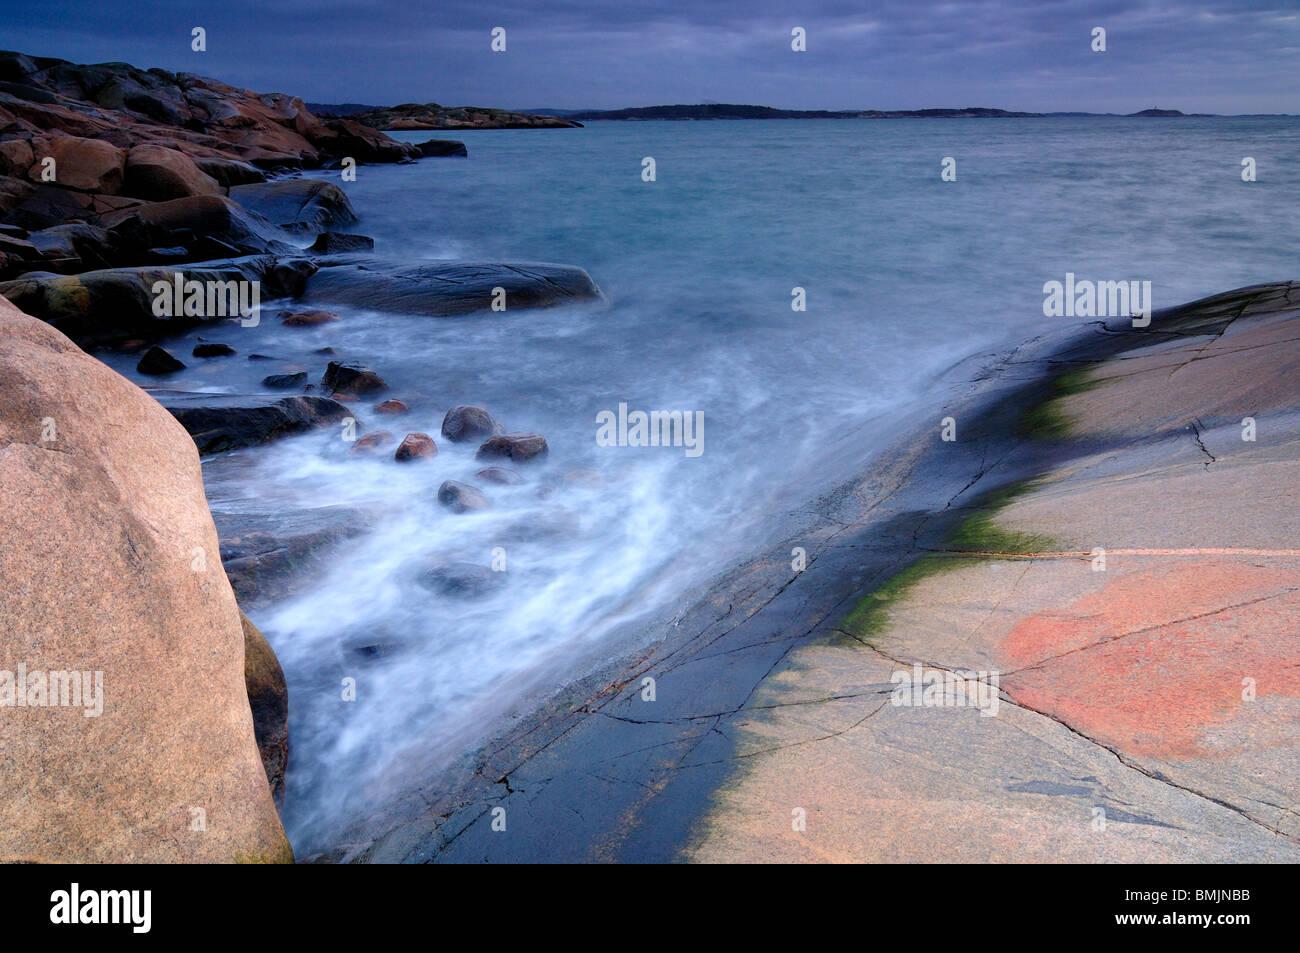 Flat rocks at the ocean - Stock Image